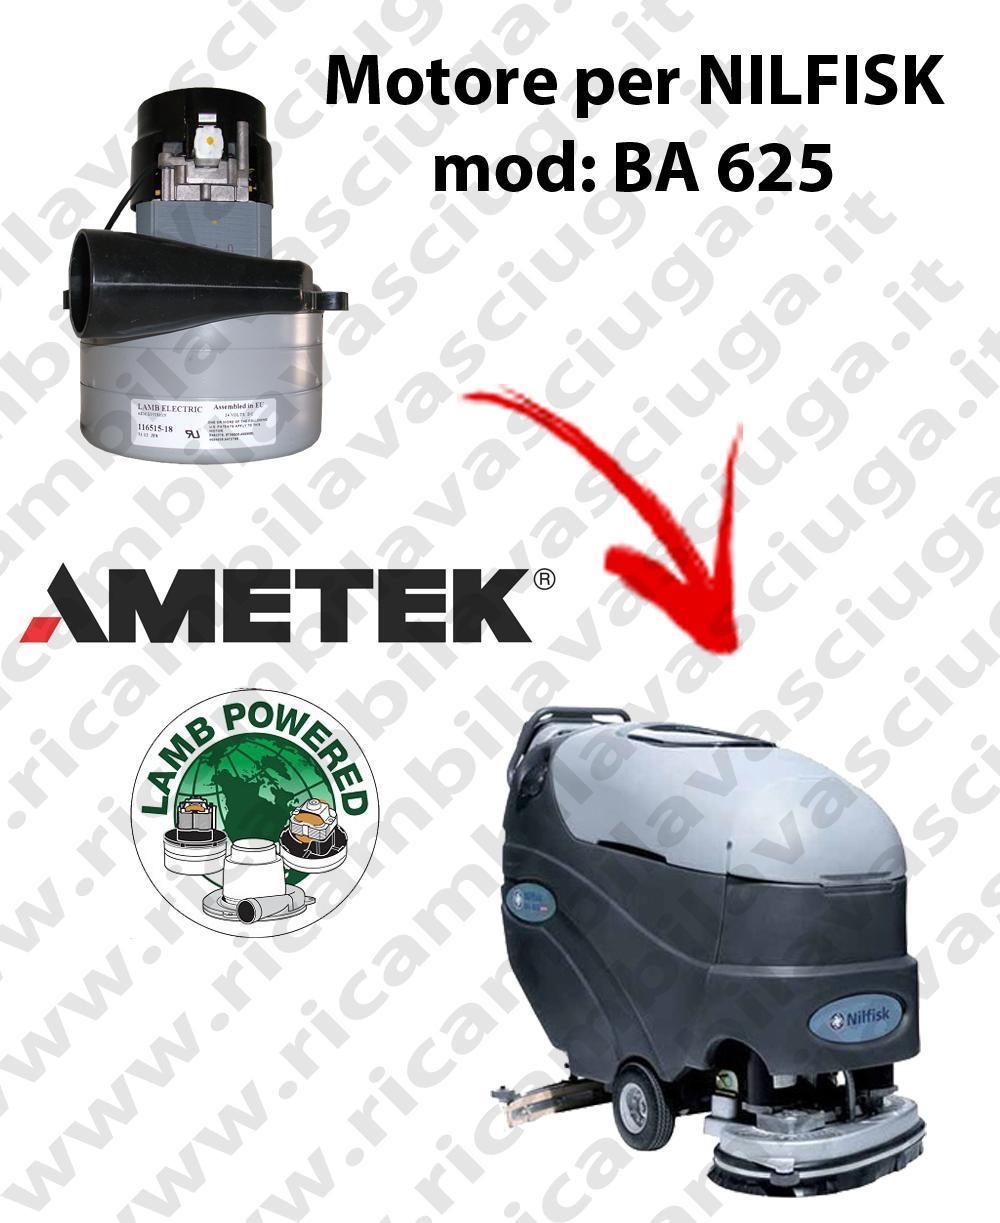 BA 625 Saugmotor LAMB AMETEK für scheuersaugmaschinen NILFISK